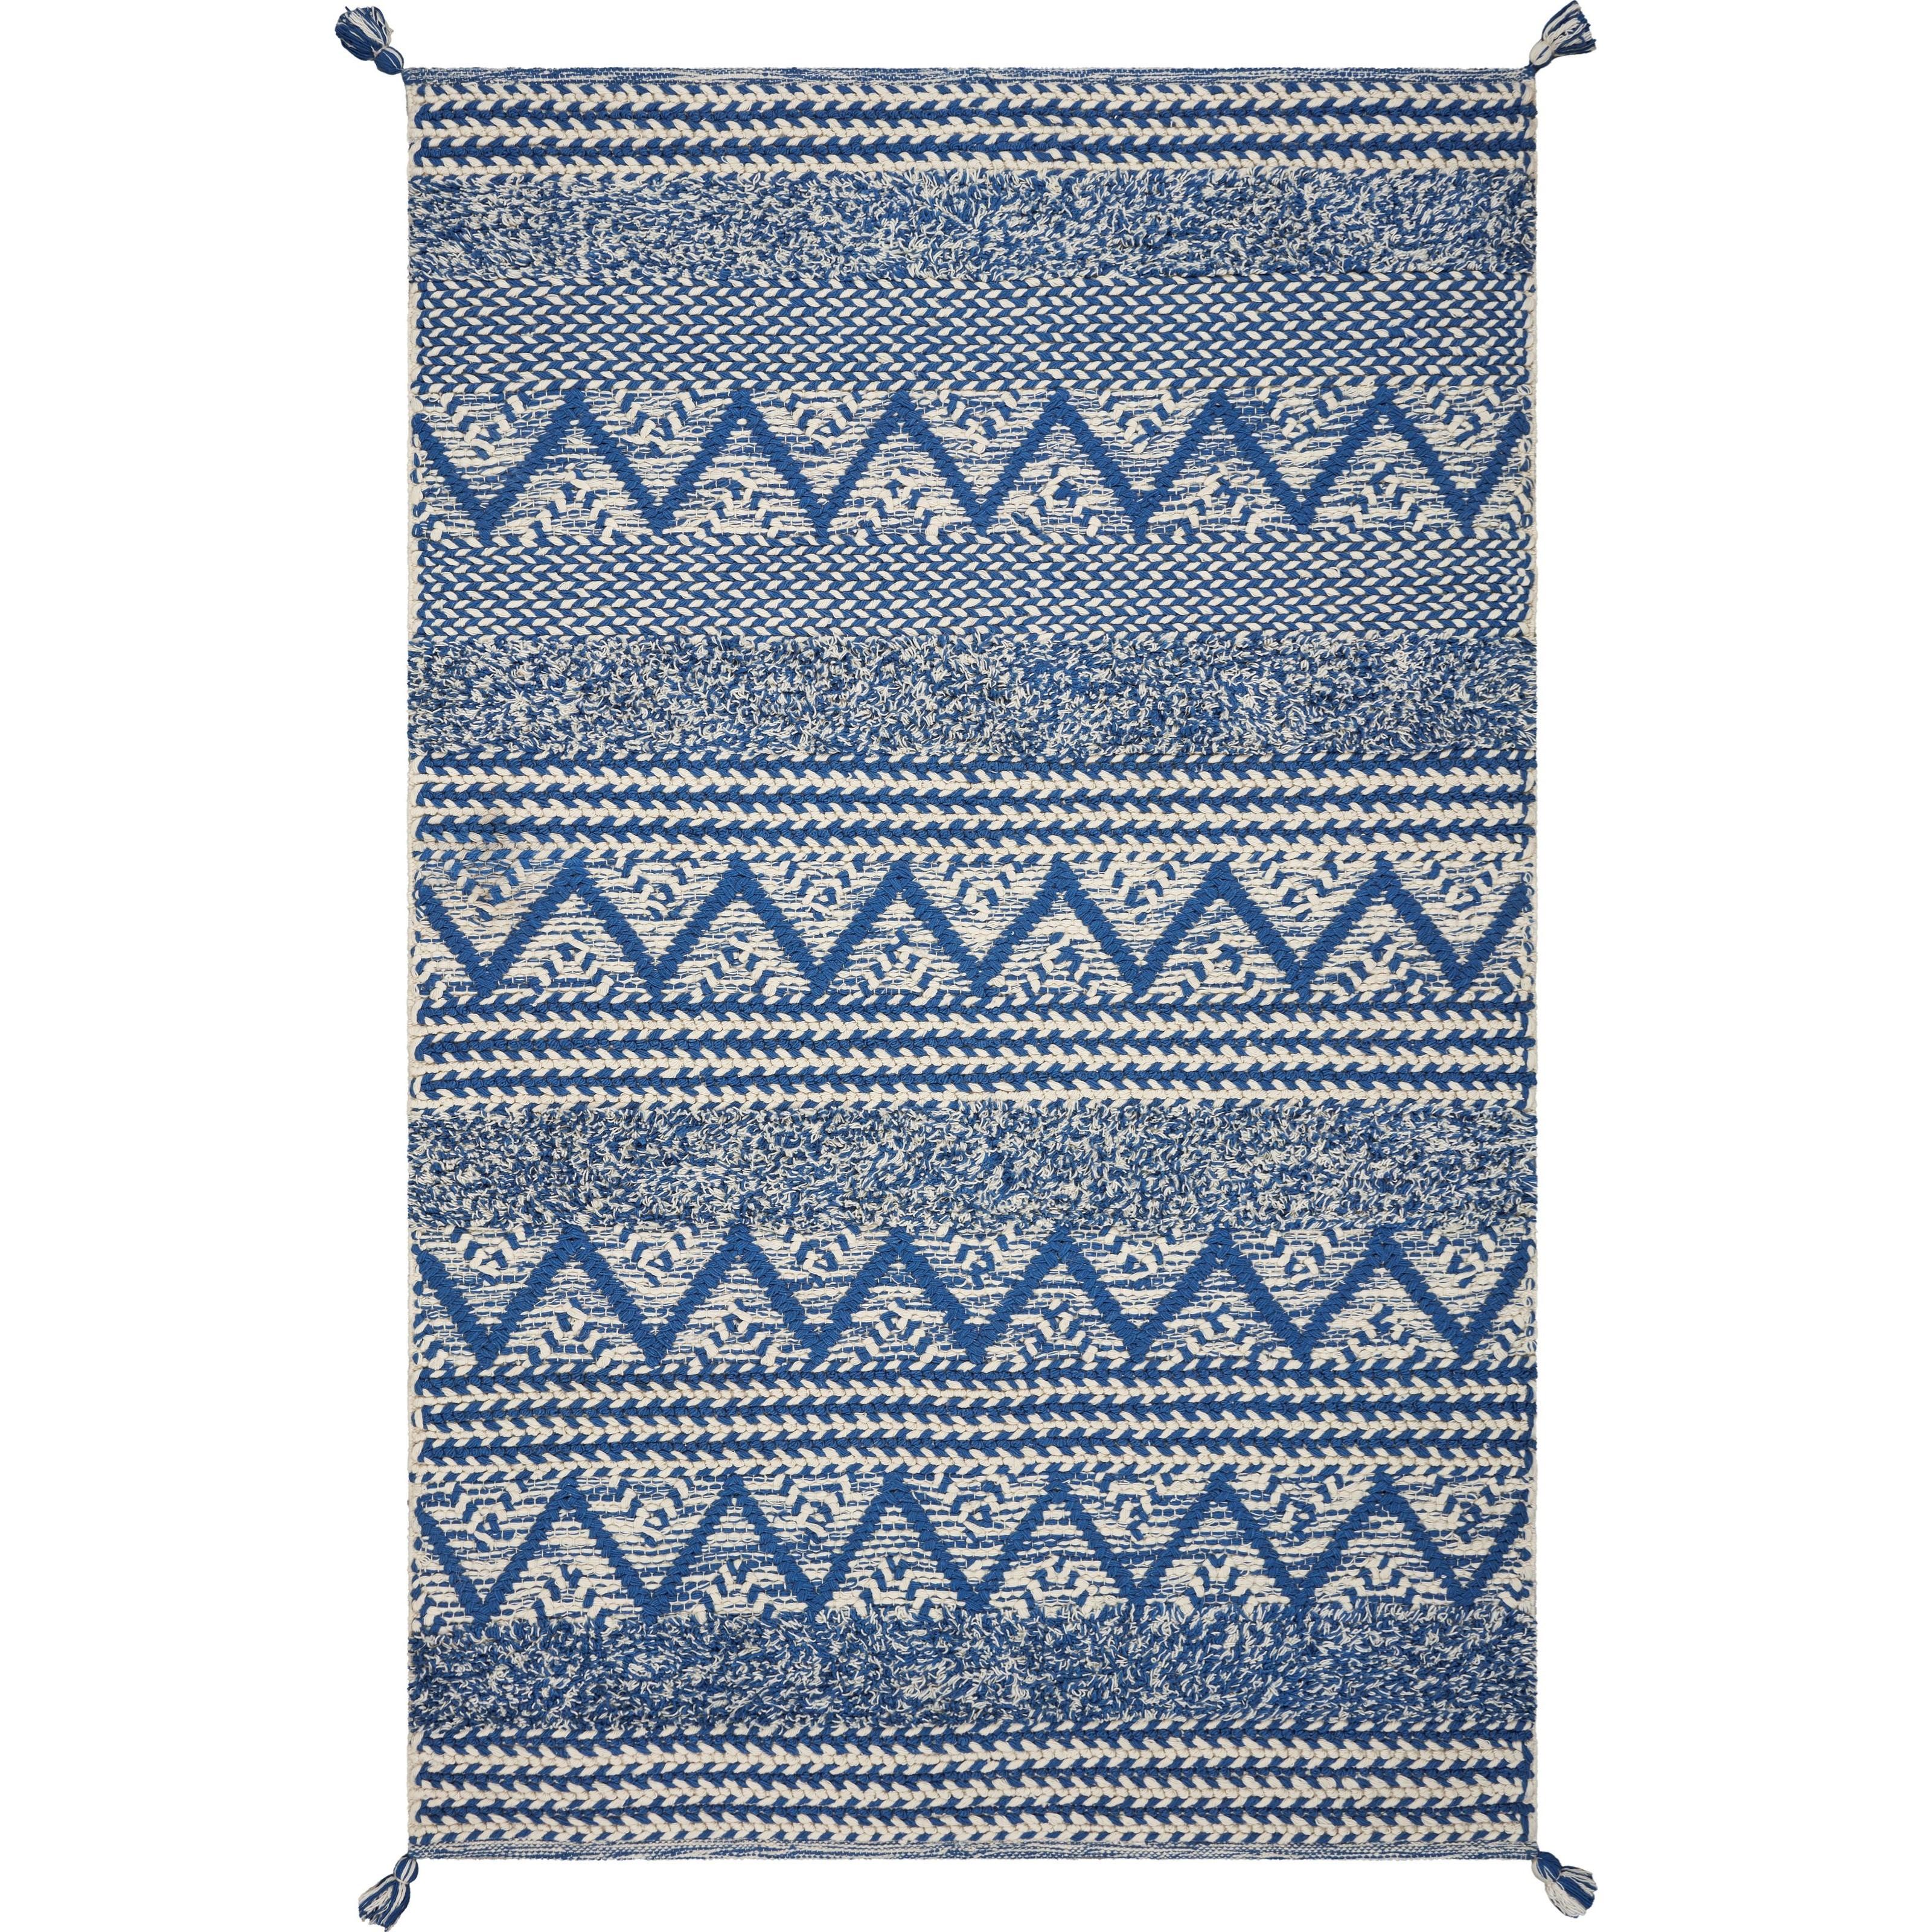 8' x 11' Blue Hermosa Beach Rug